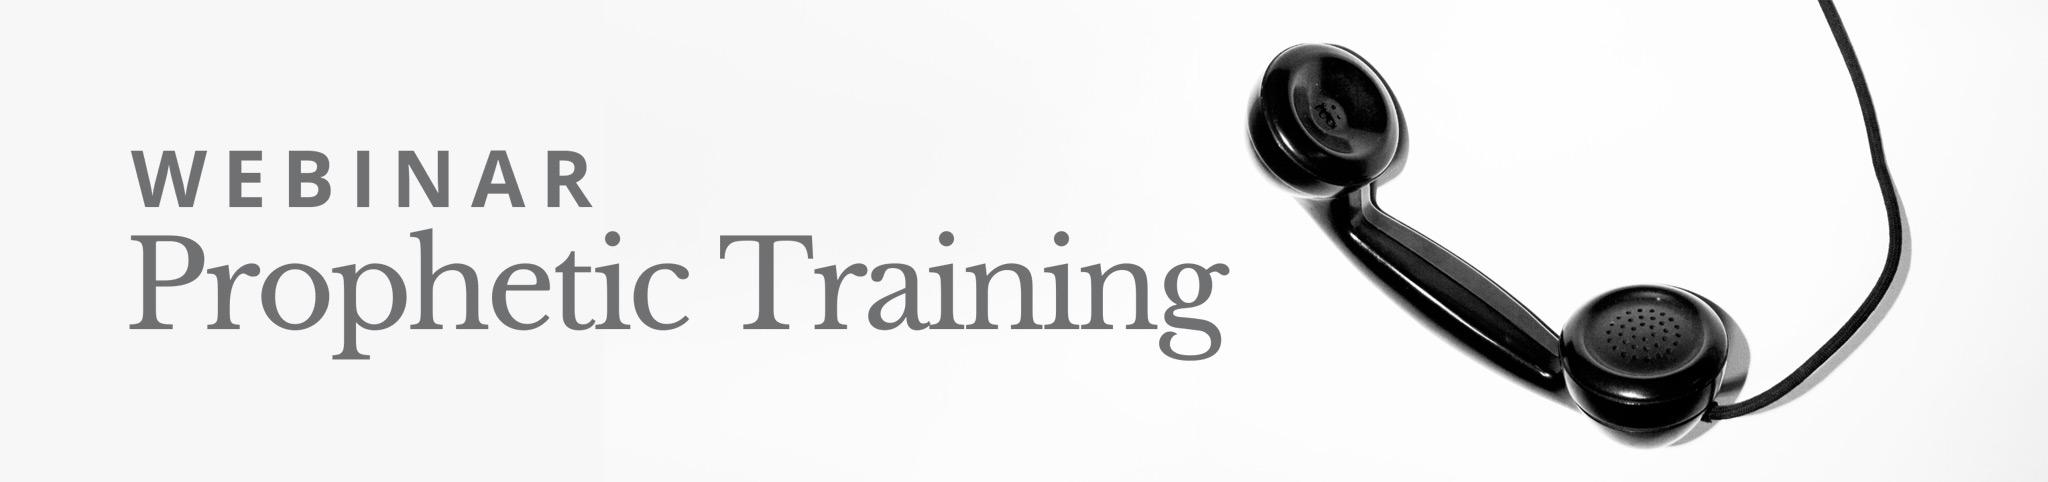 Prophetic Training (Webinar)